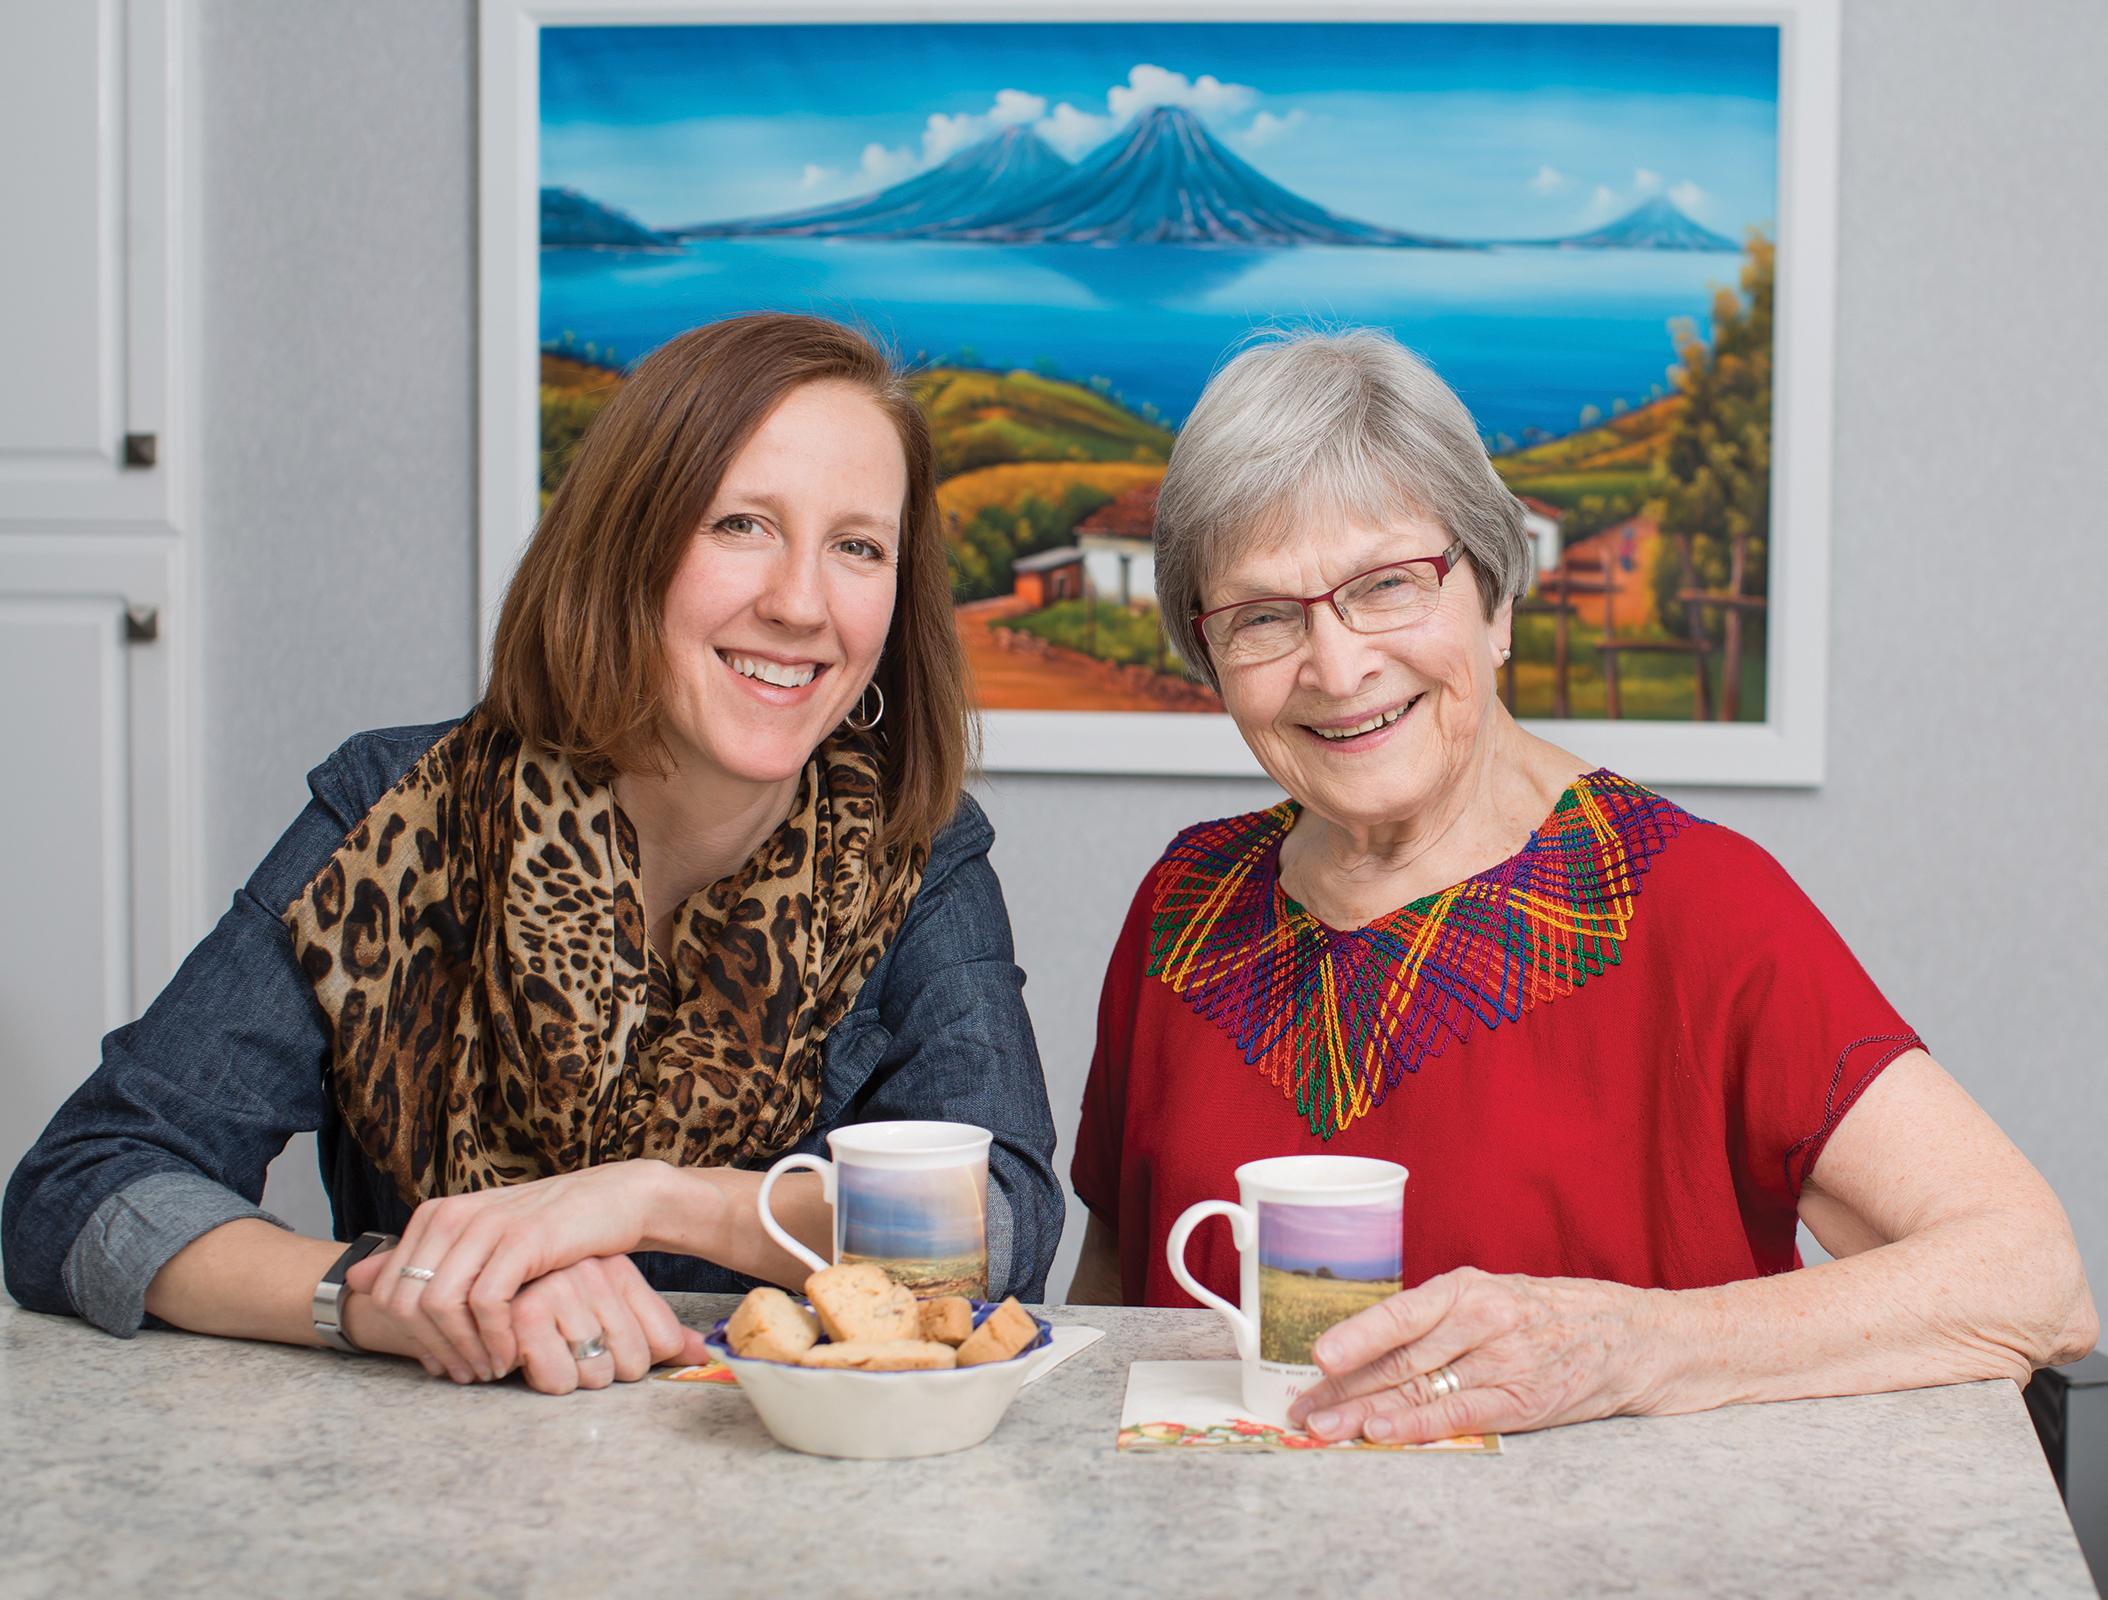 Elaine Christiansen and Sarah